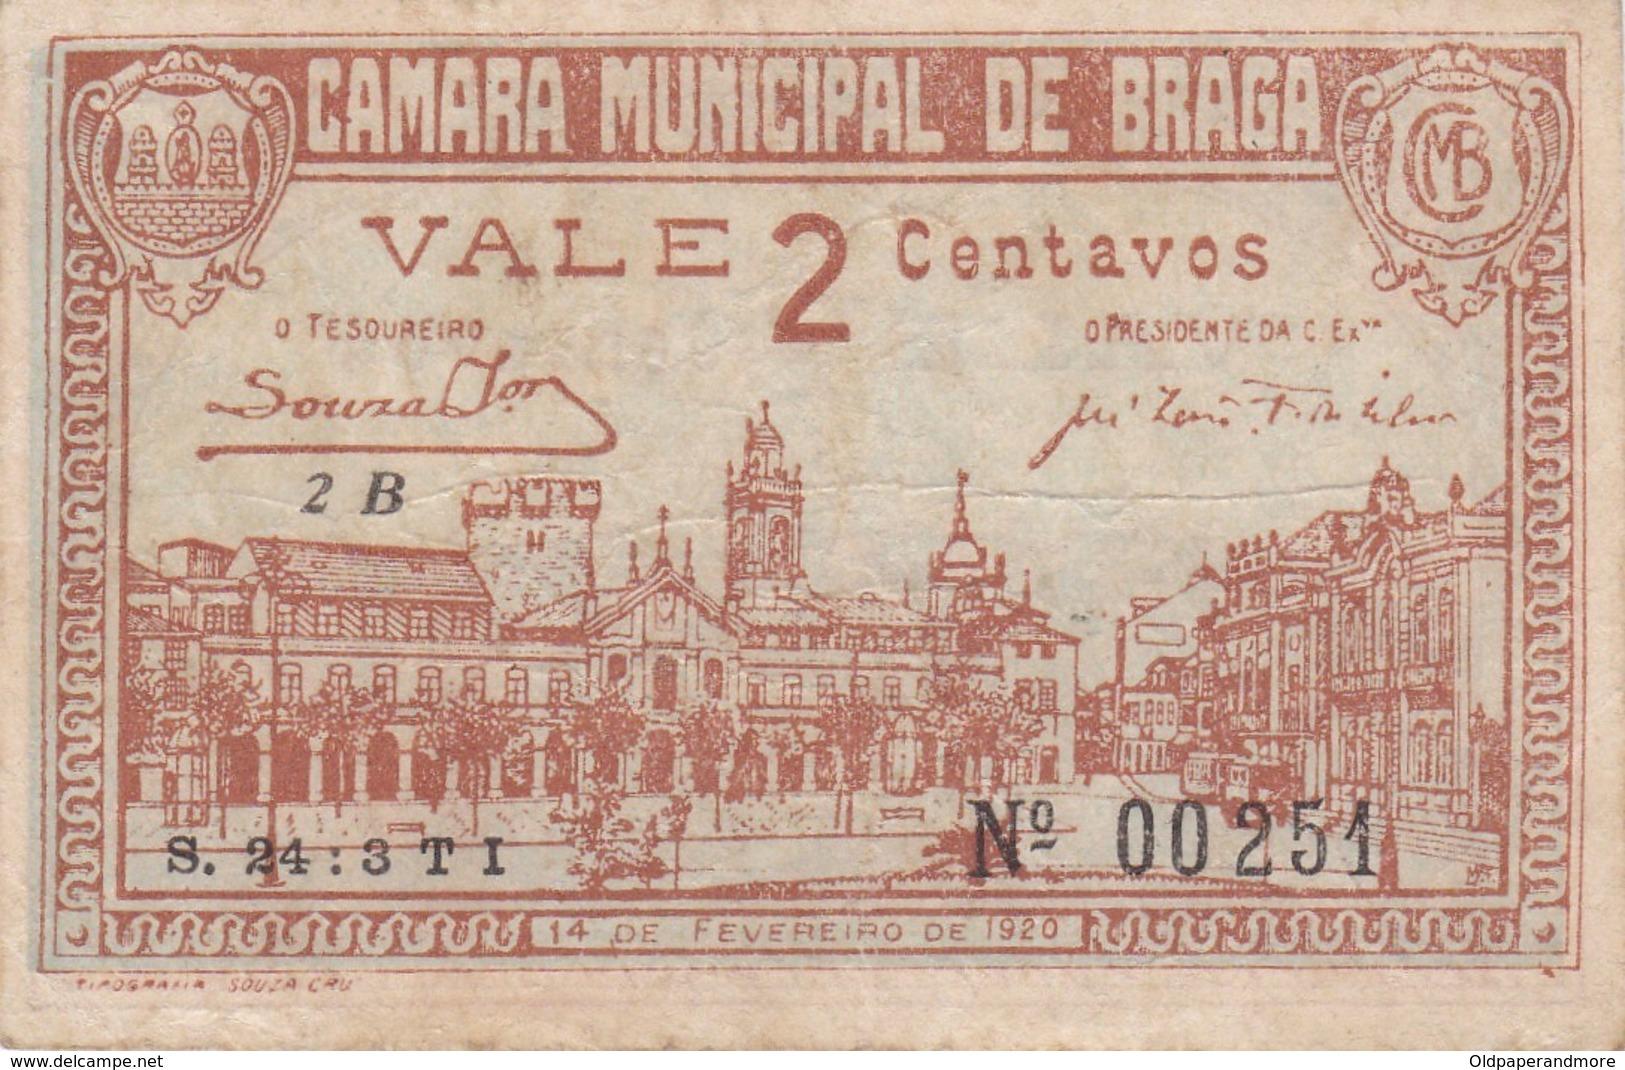 PORTUGAL BRAGA - CAMARA MUNICIPAL DE BRAGA  - CÉDULA De 2 CENTAVOS  - EMERGENCY PAPER MONEY - Portugal